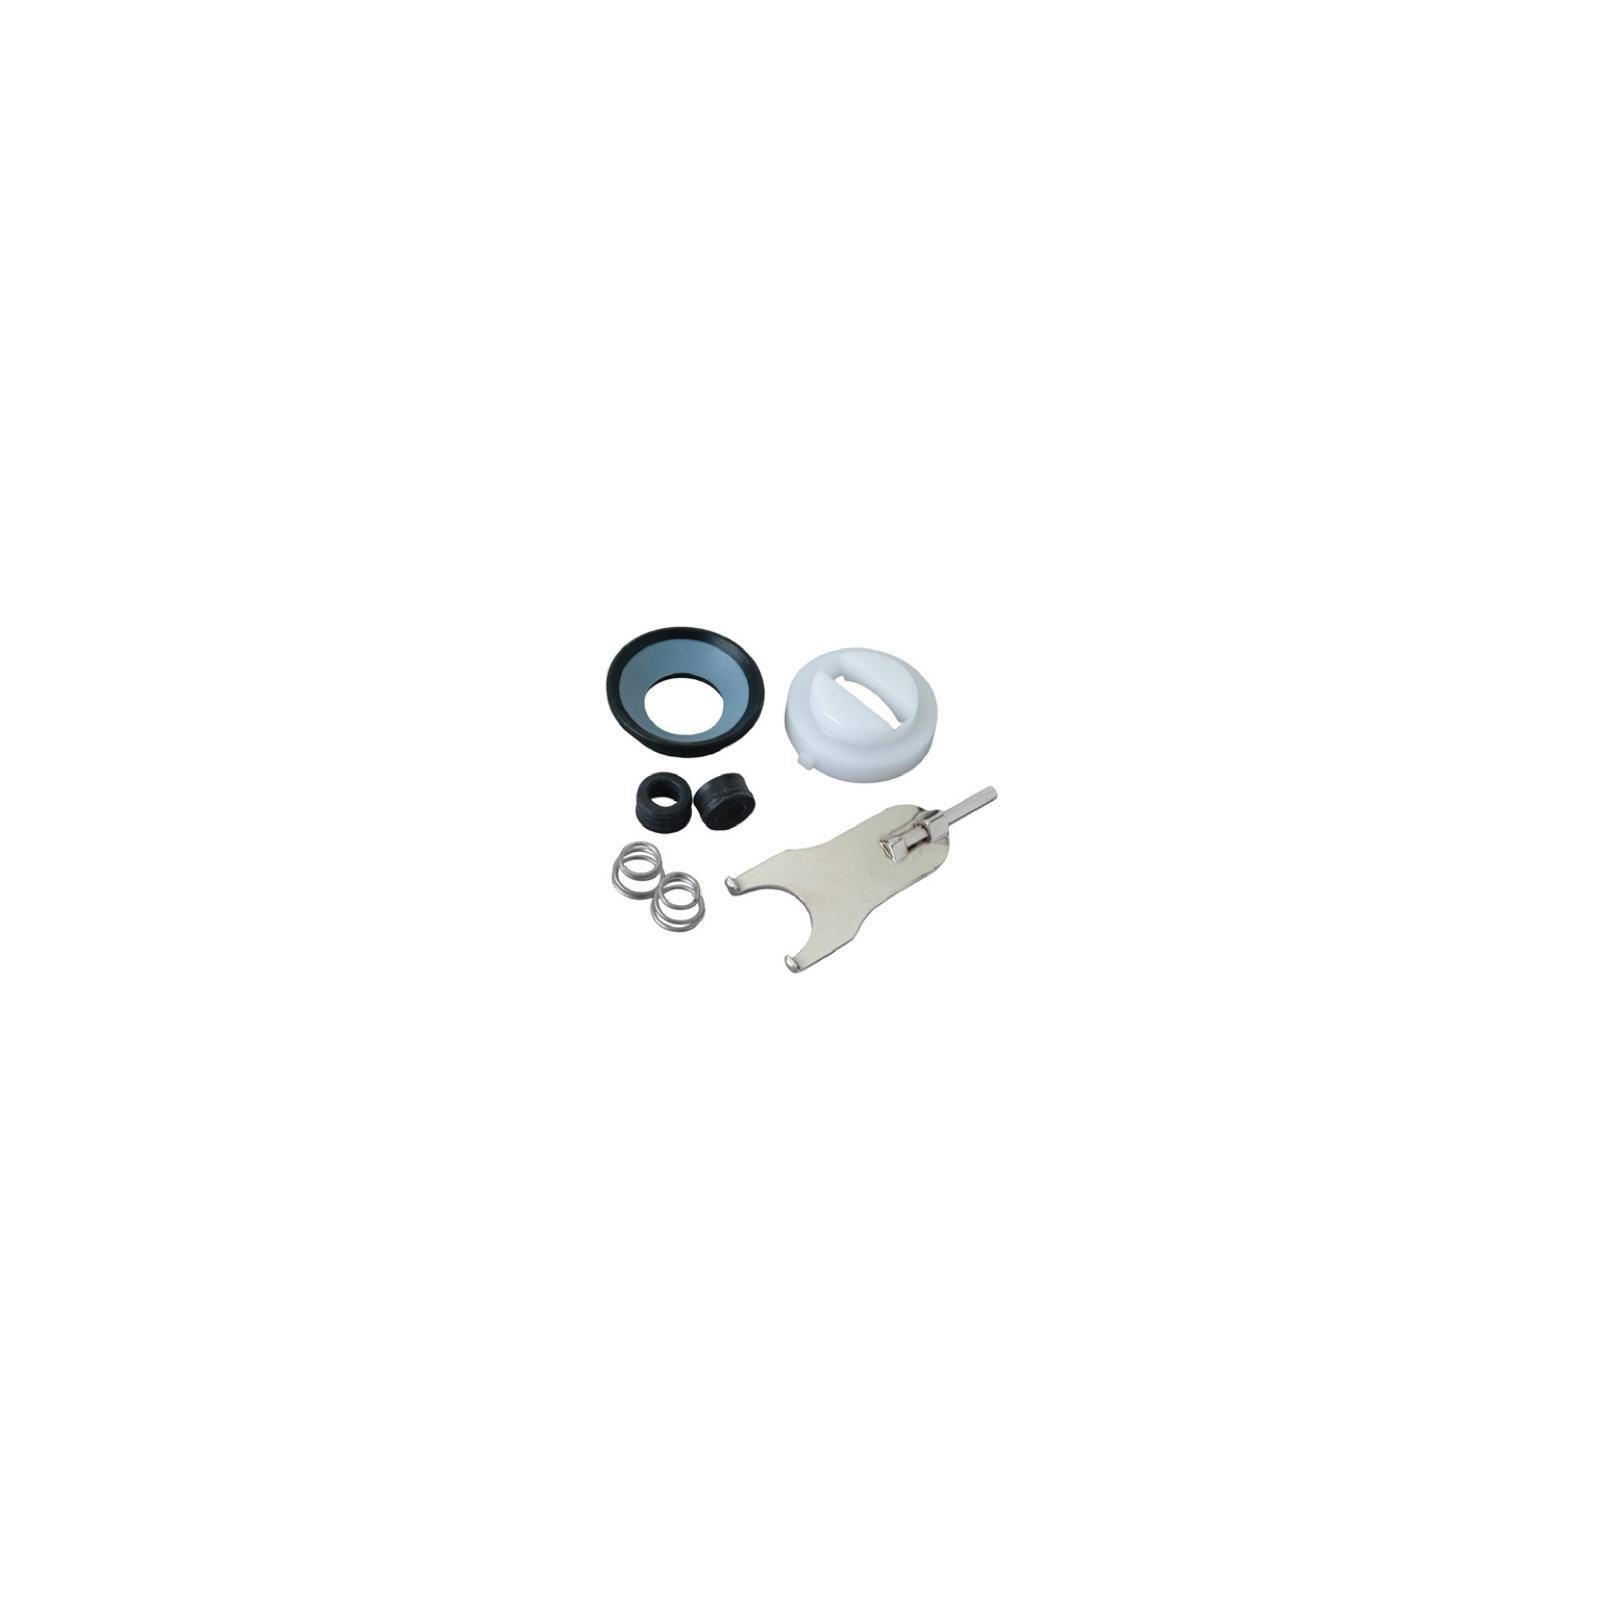 Brass Craft Service Parts SL0105 Delta Single Handle Bath Faucet Repair Kit - Quantity 5 by BrassCraft